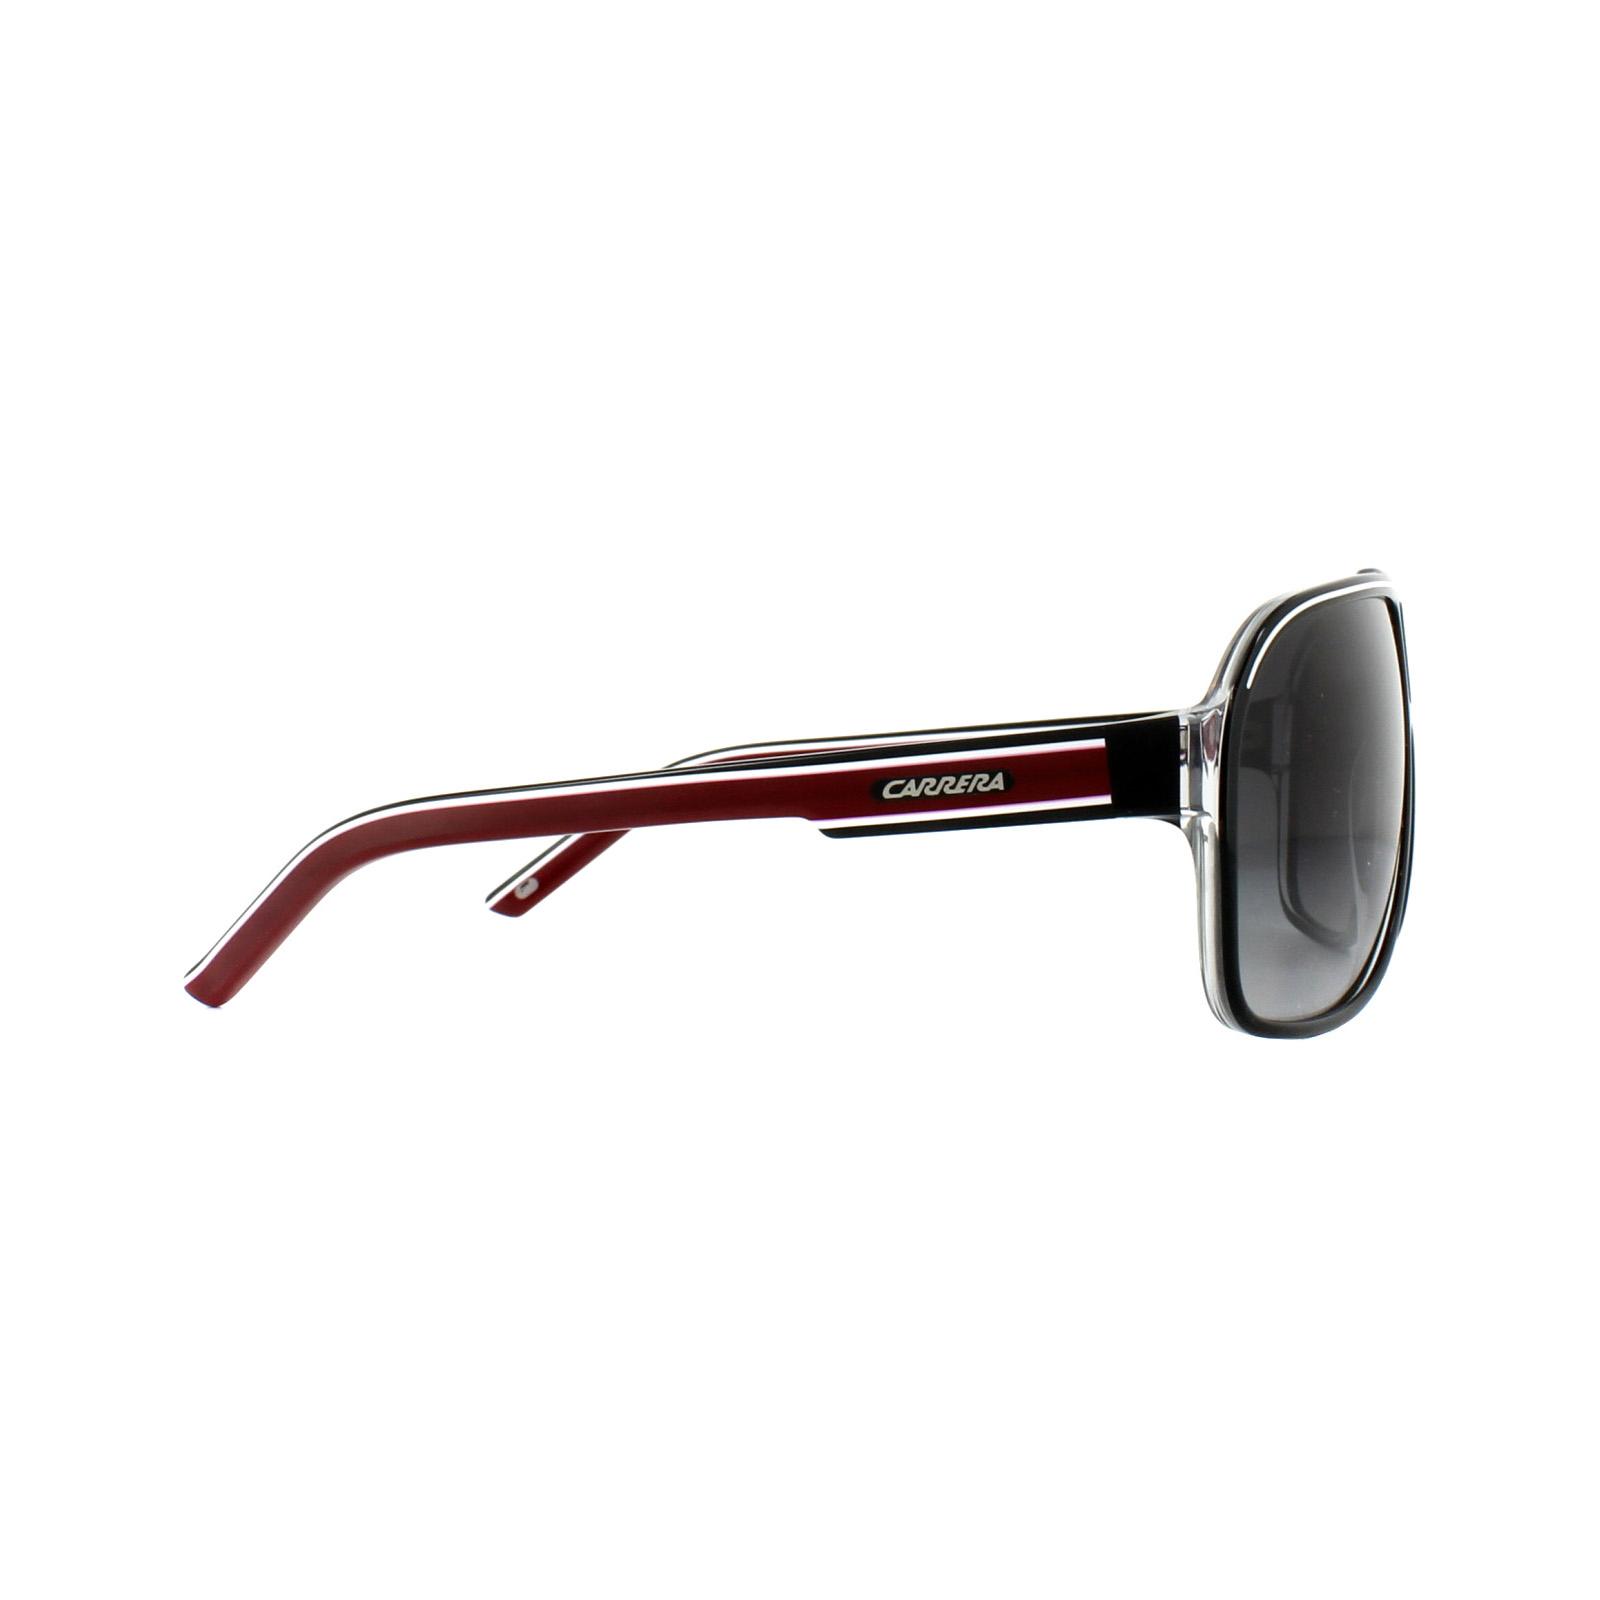 110df161c79c27 Sentinel Carrera Sunglasses Grand Prix 2 T4O 9O Black Dark Grey Gradient